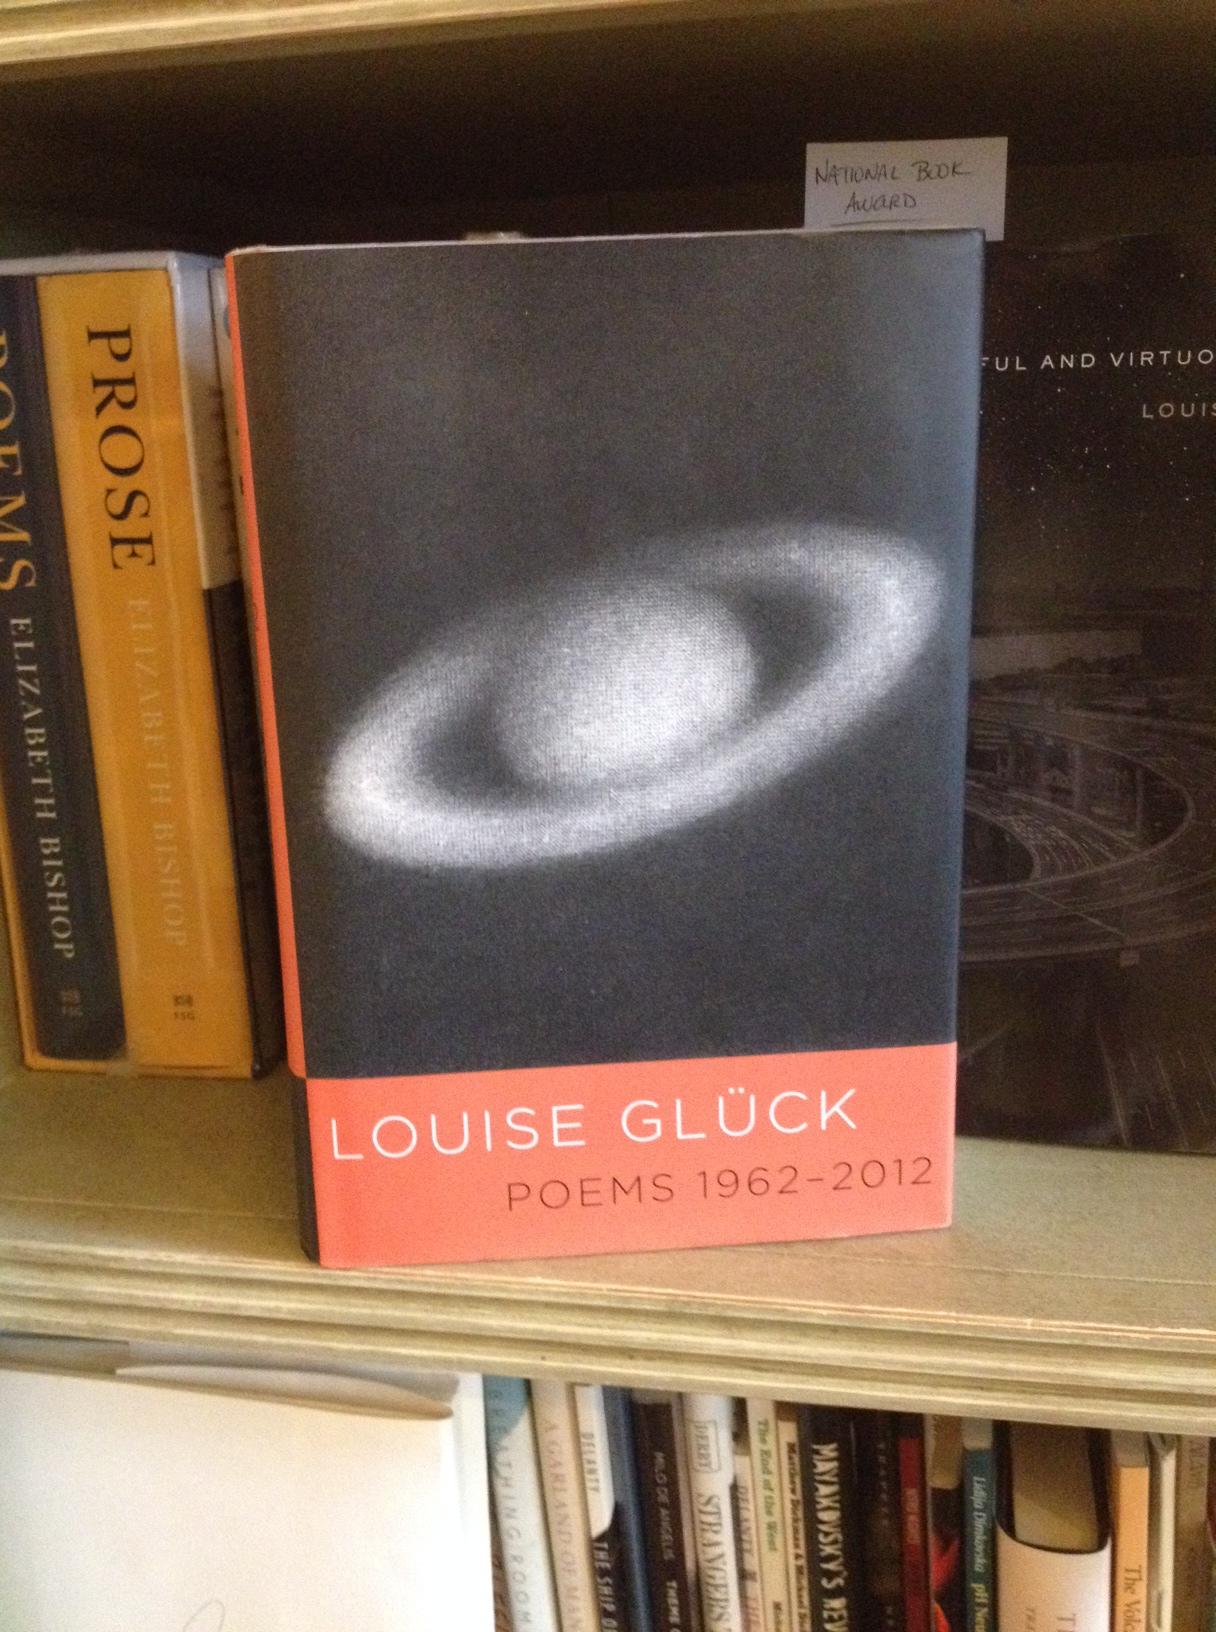 Louise Glücks Collected Poems Faulkner House Books